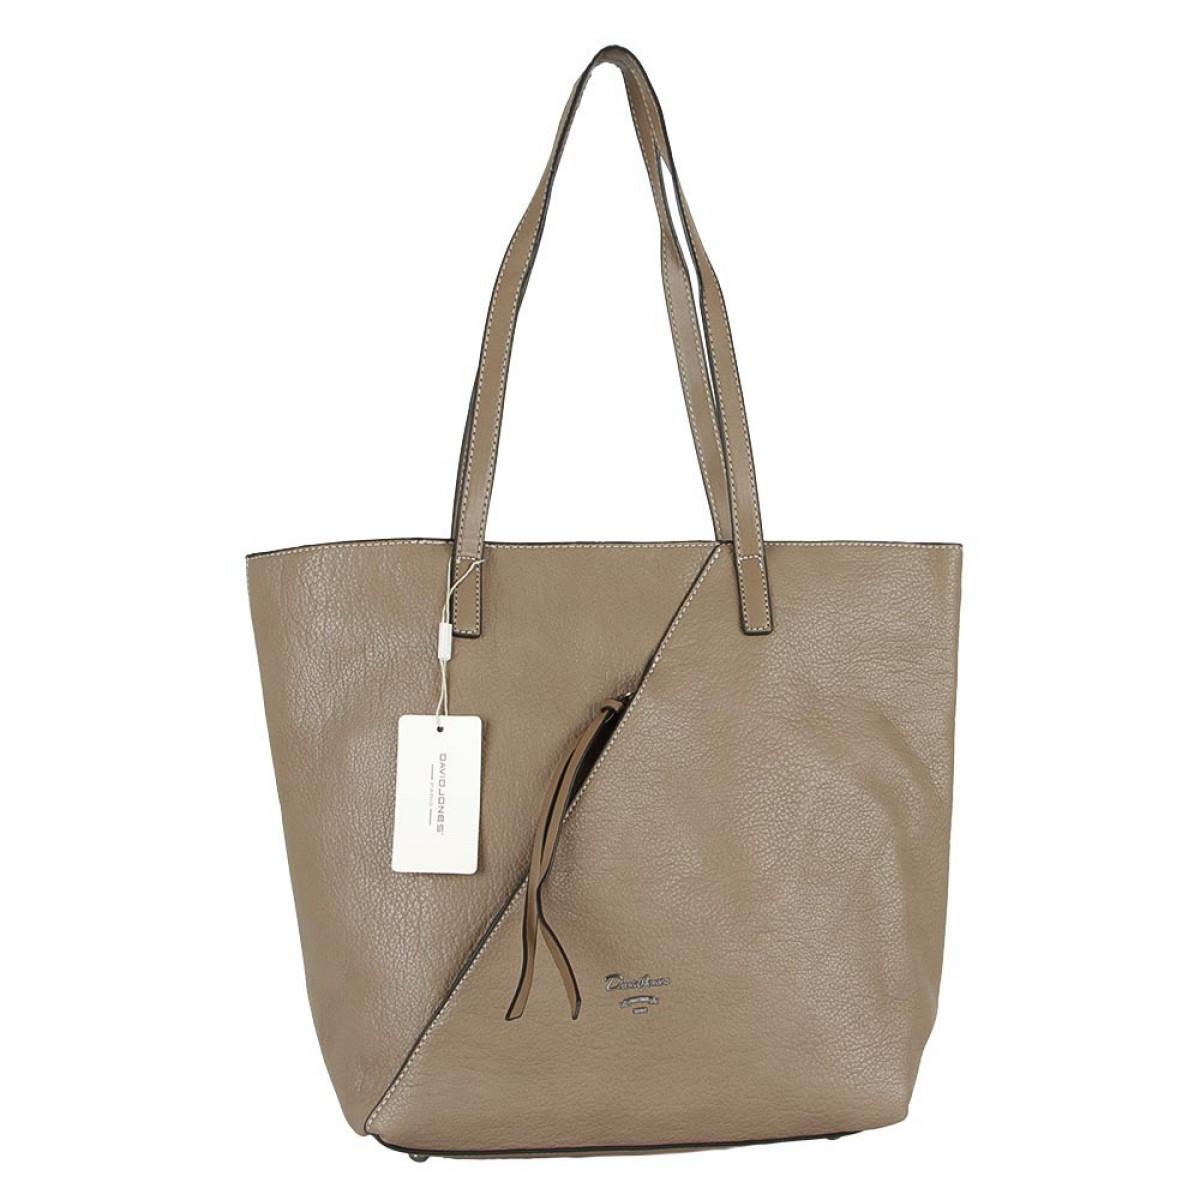 Жіноча сумка David Jones 6102-2 D.CAMEL